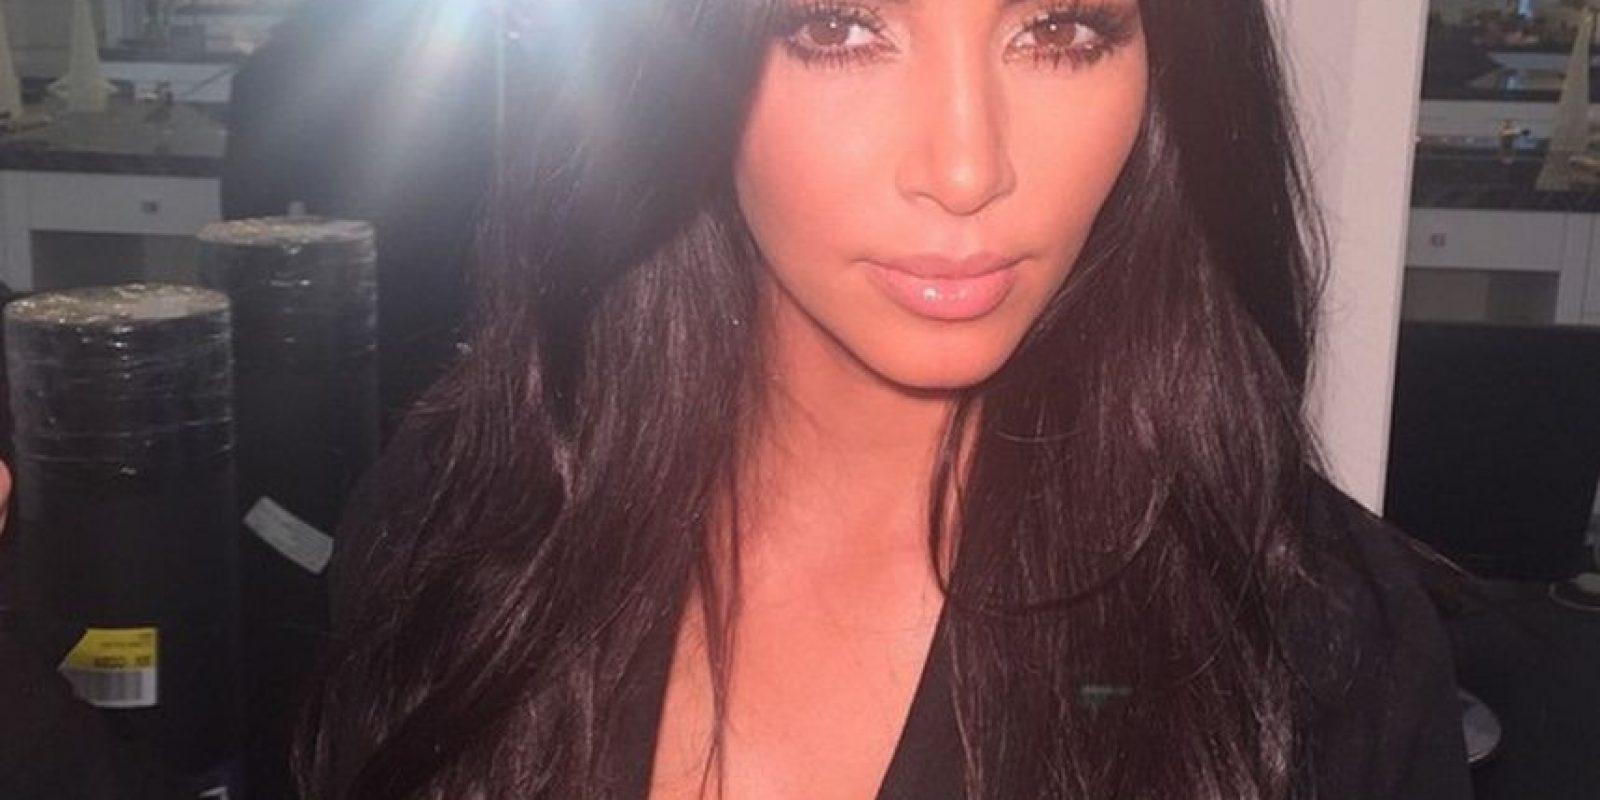 ¿Cómo les parece que se ve mejor? Foto:Instagram Kim Kardashian